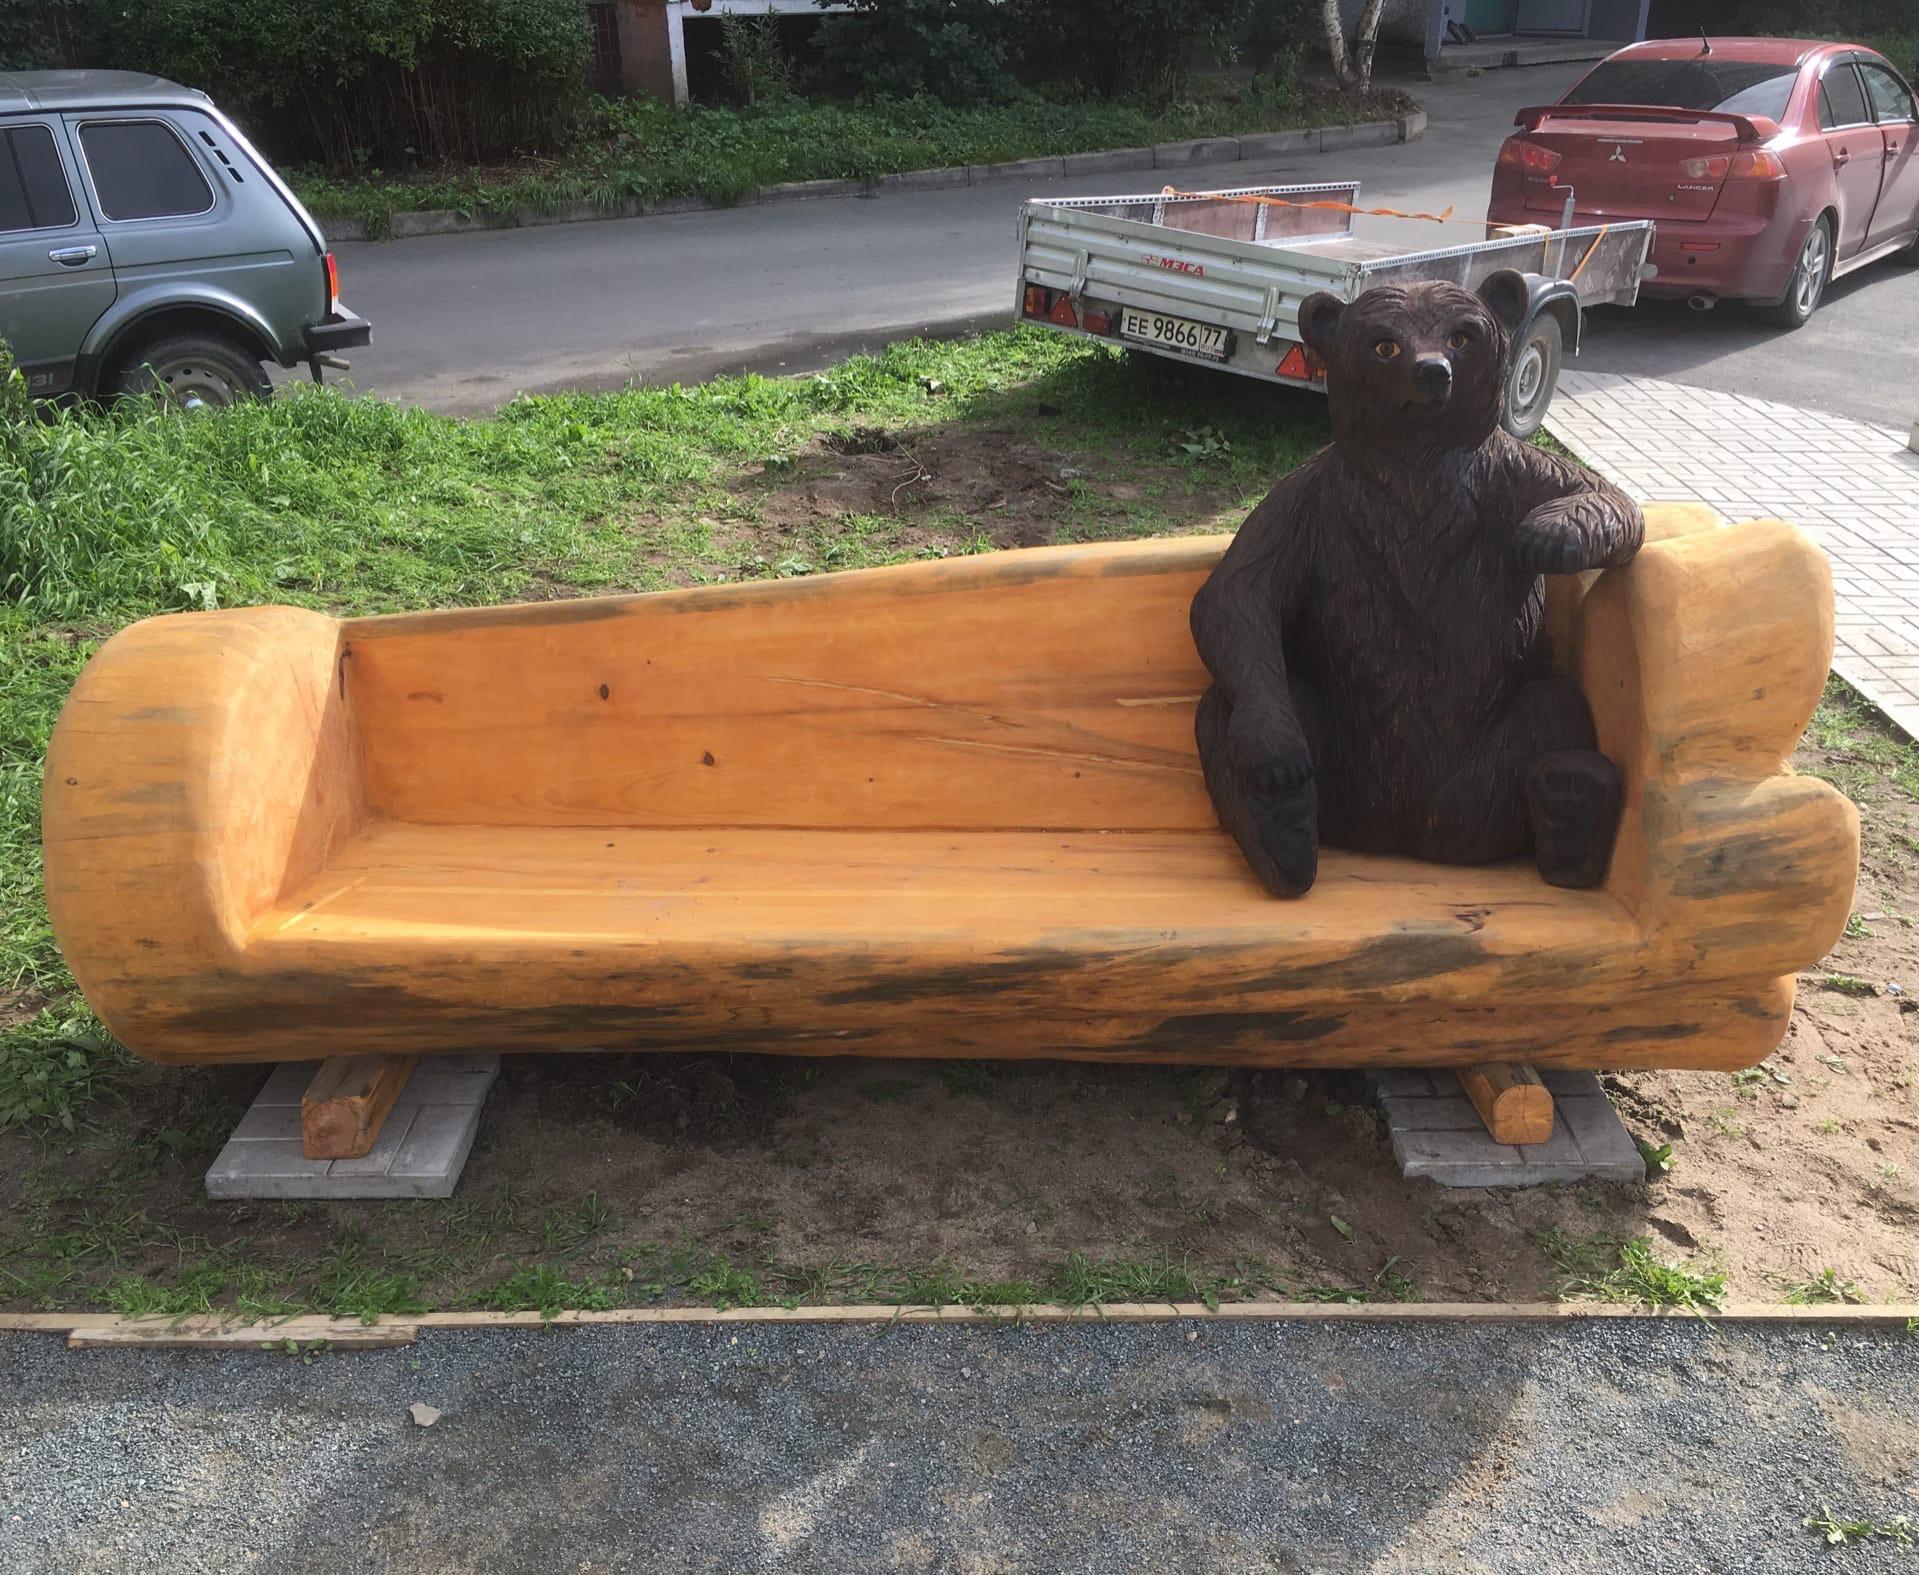 спешите медведь на улице в петрозаводске фото без истории, как